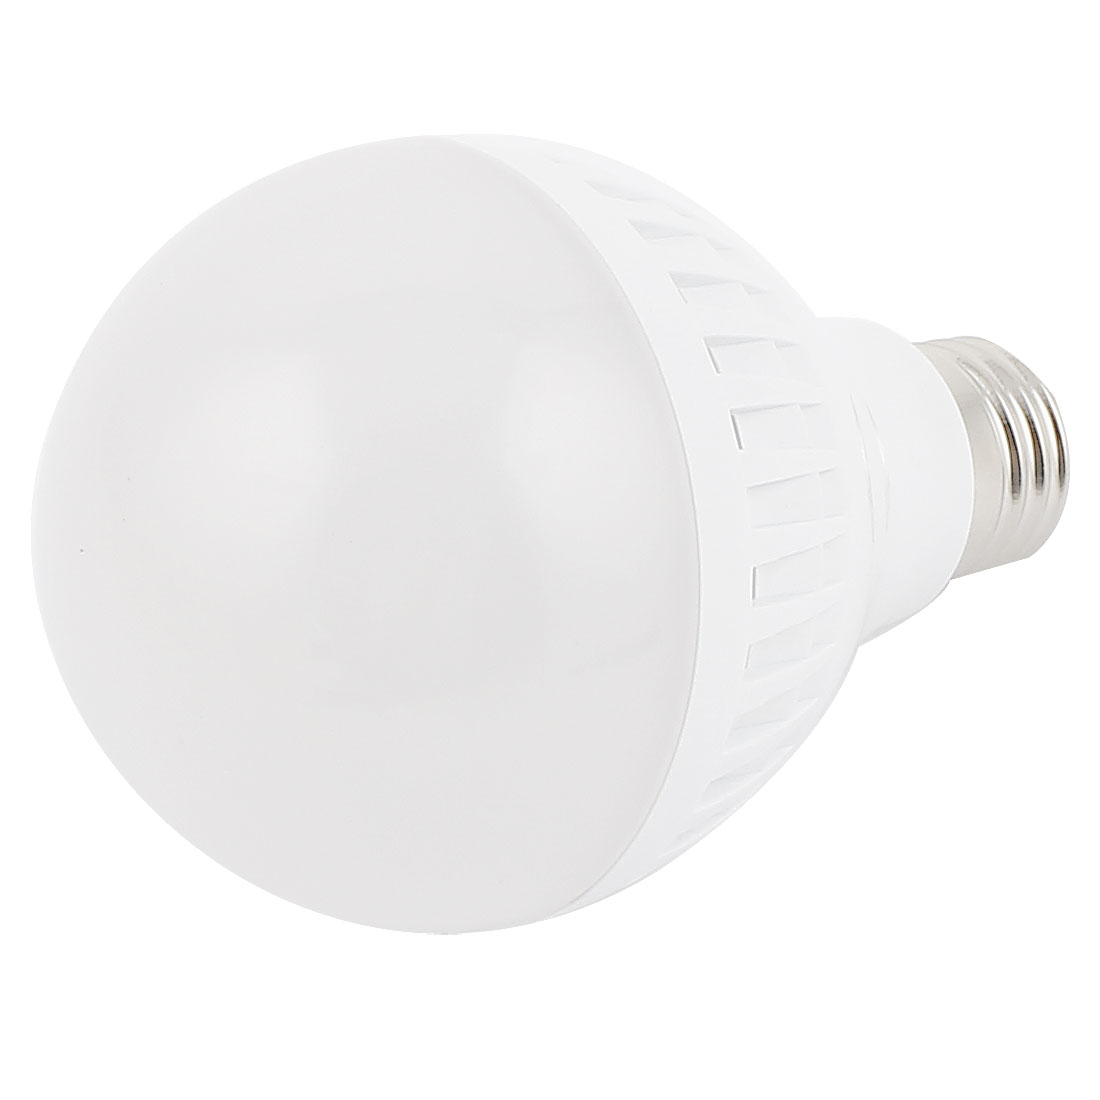 9W White Plastic E27 Base 80mm Dia Globe Ball Bulb LED Lamp Shell